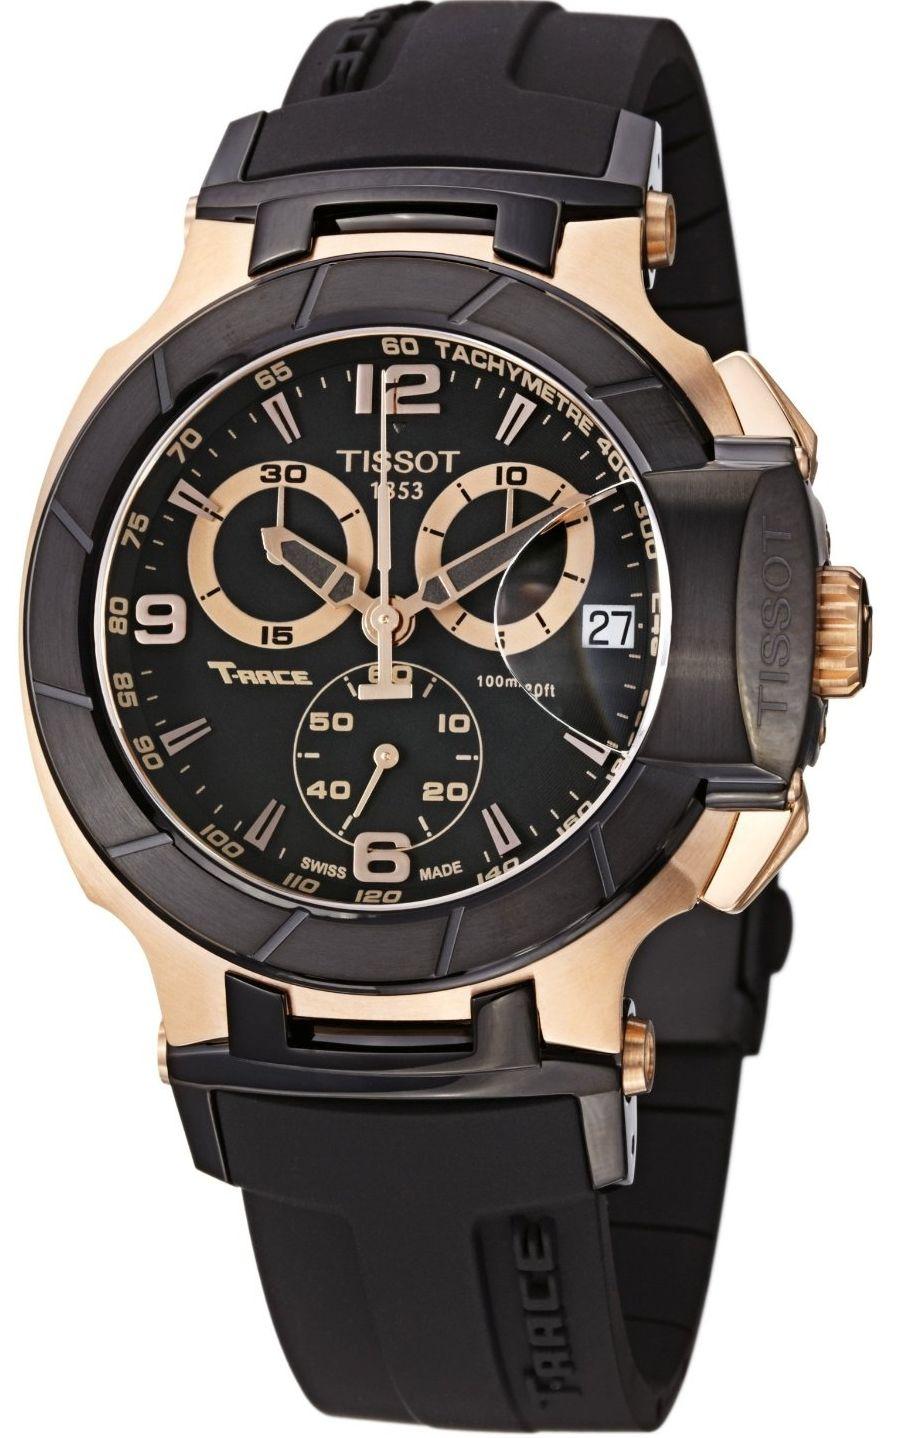 Tissot Men's Strap Watch Tissot watches have been a